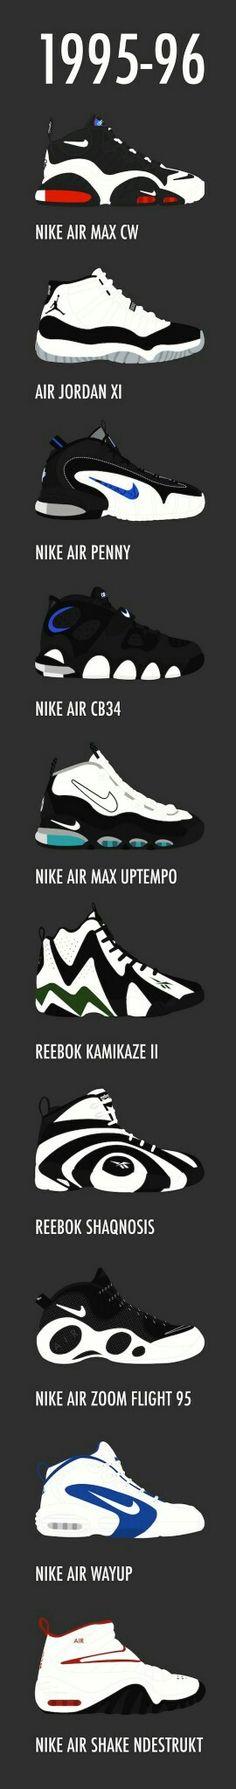 90s Shoes, Nike Shoes, Jordans Sneakers, Sneaker Heads, Michael Jordan,  Basketball Shoes, Scottie Pippen, Gusto, Samurai